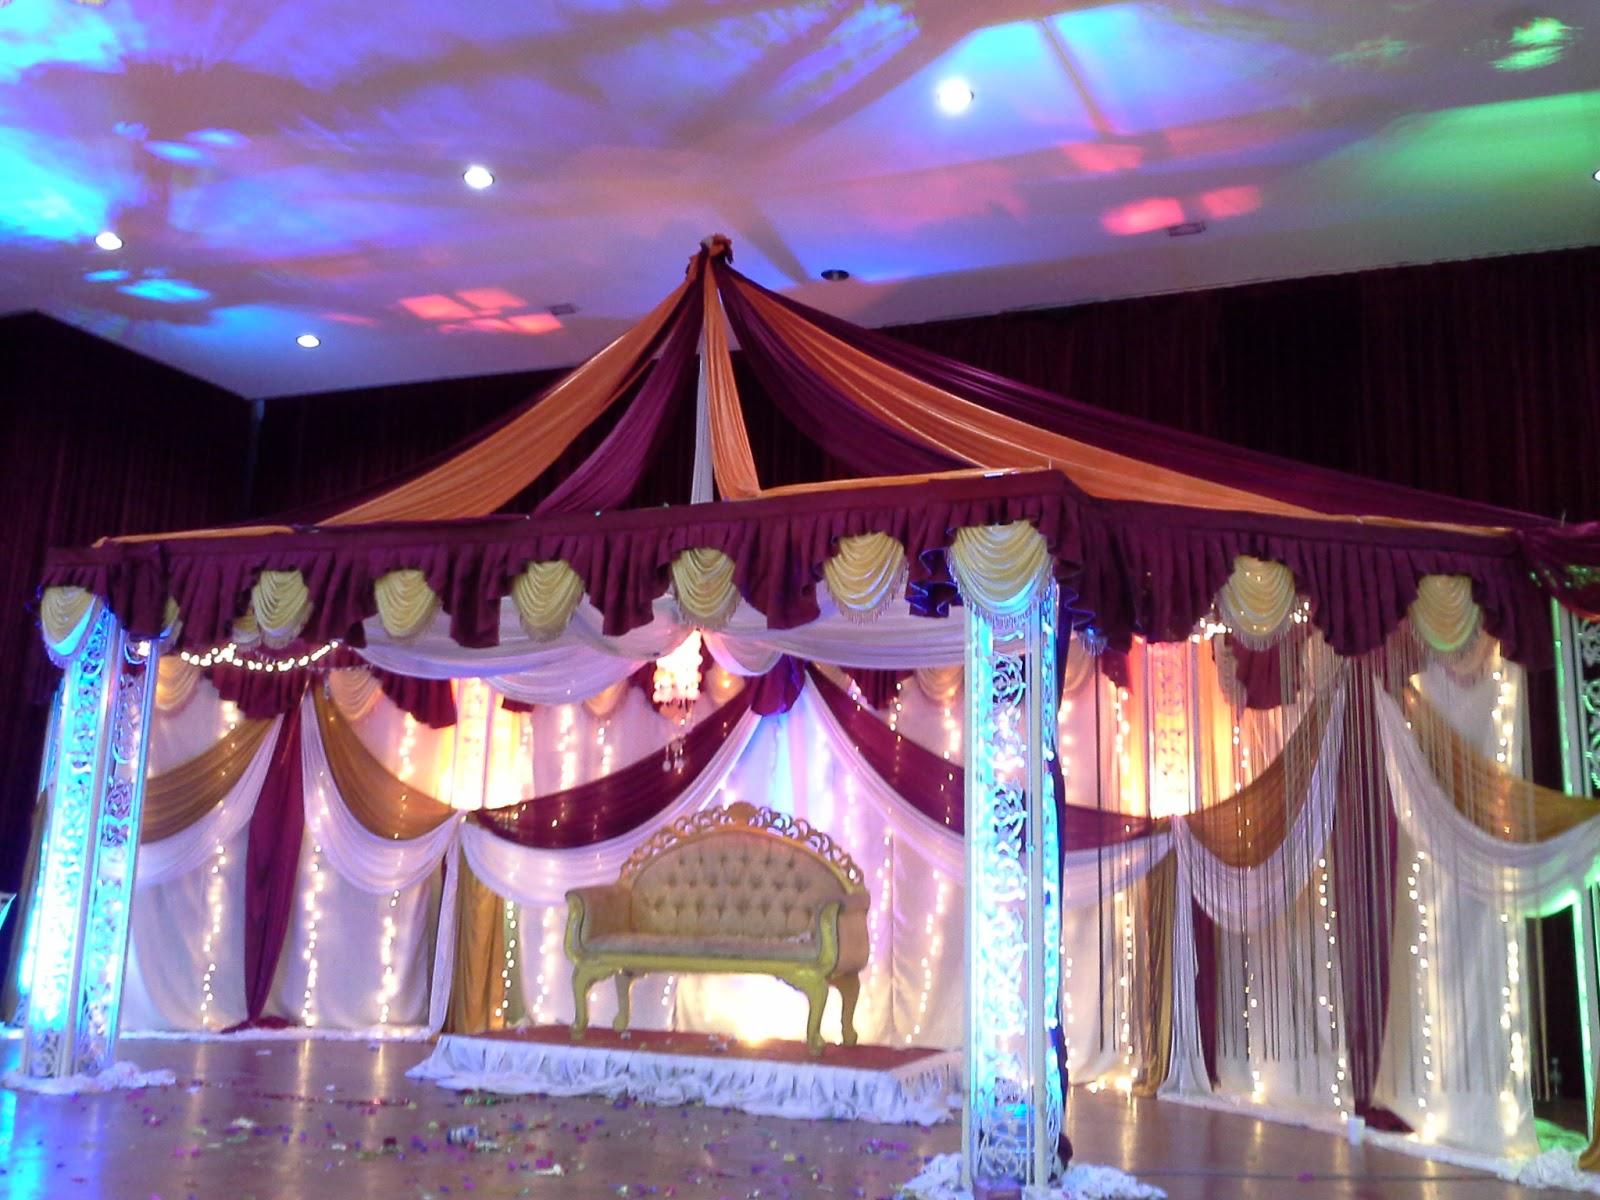 Kisha mega events indian wedding manavarai by kisha indian wedding manavarai by kisha junglespirit Image collections